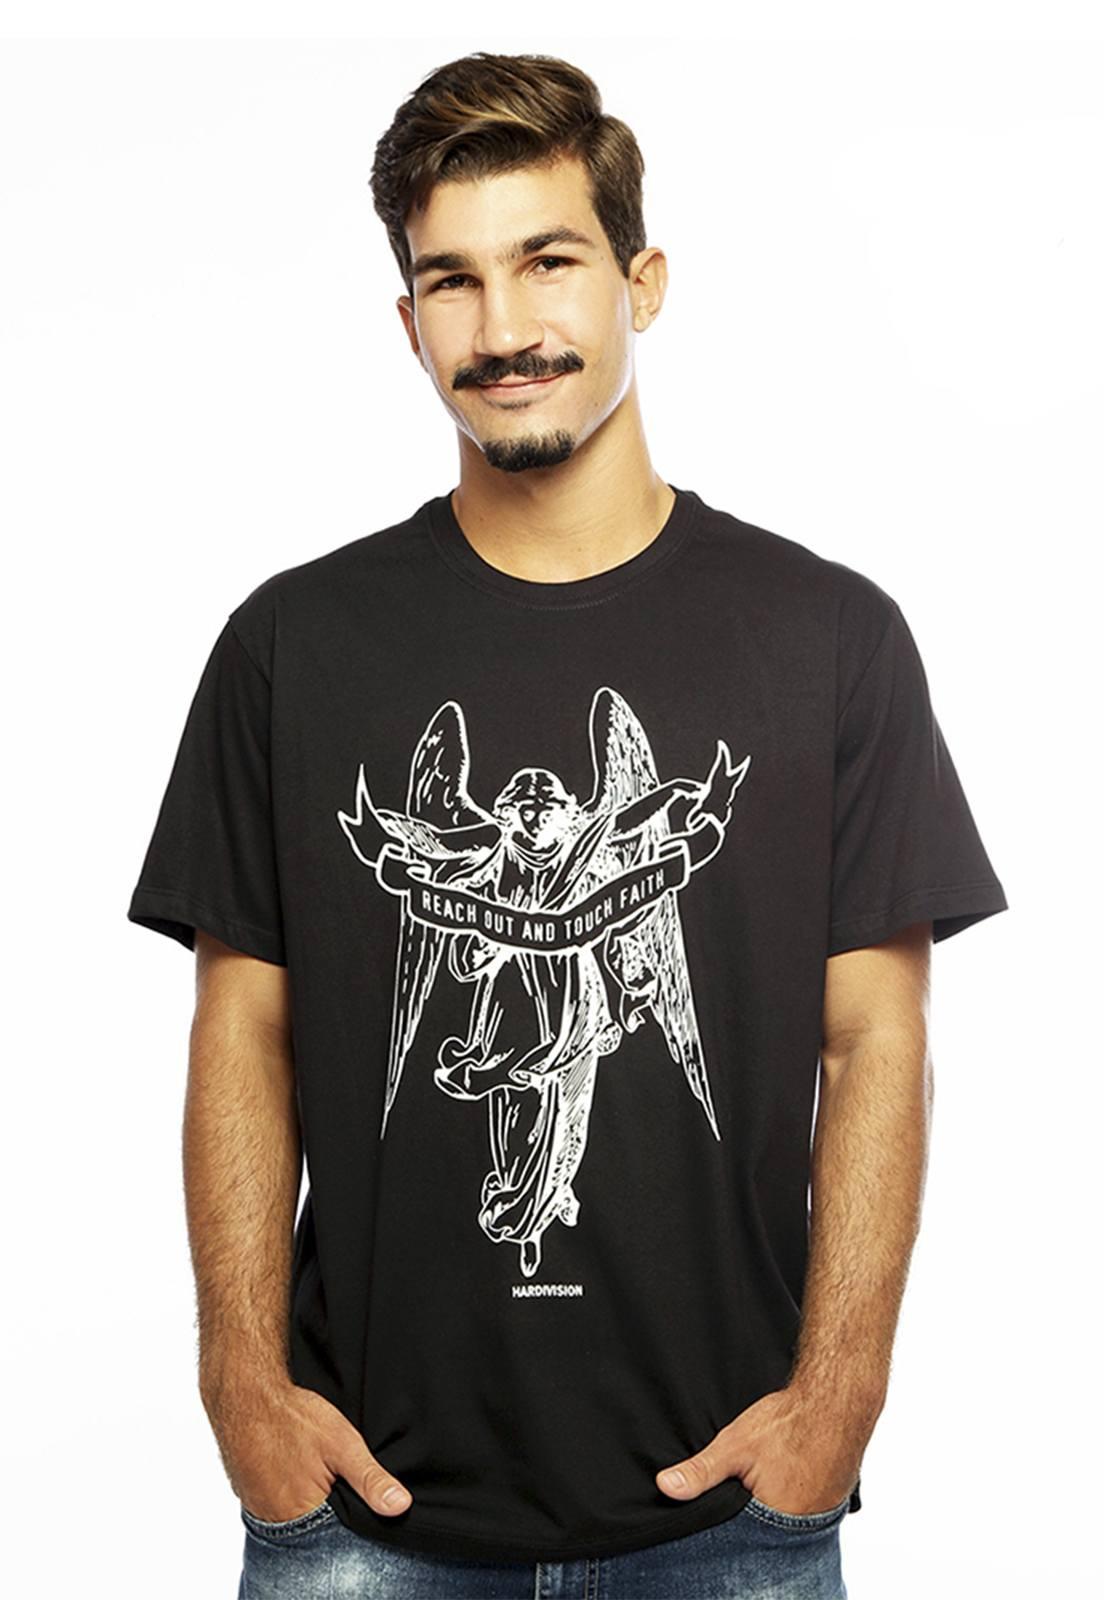 Camiseta masculina preta Anjo - 100% algodão - Hardivision